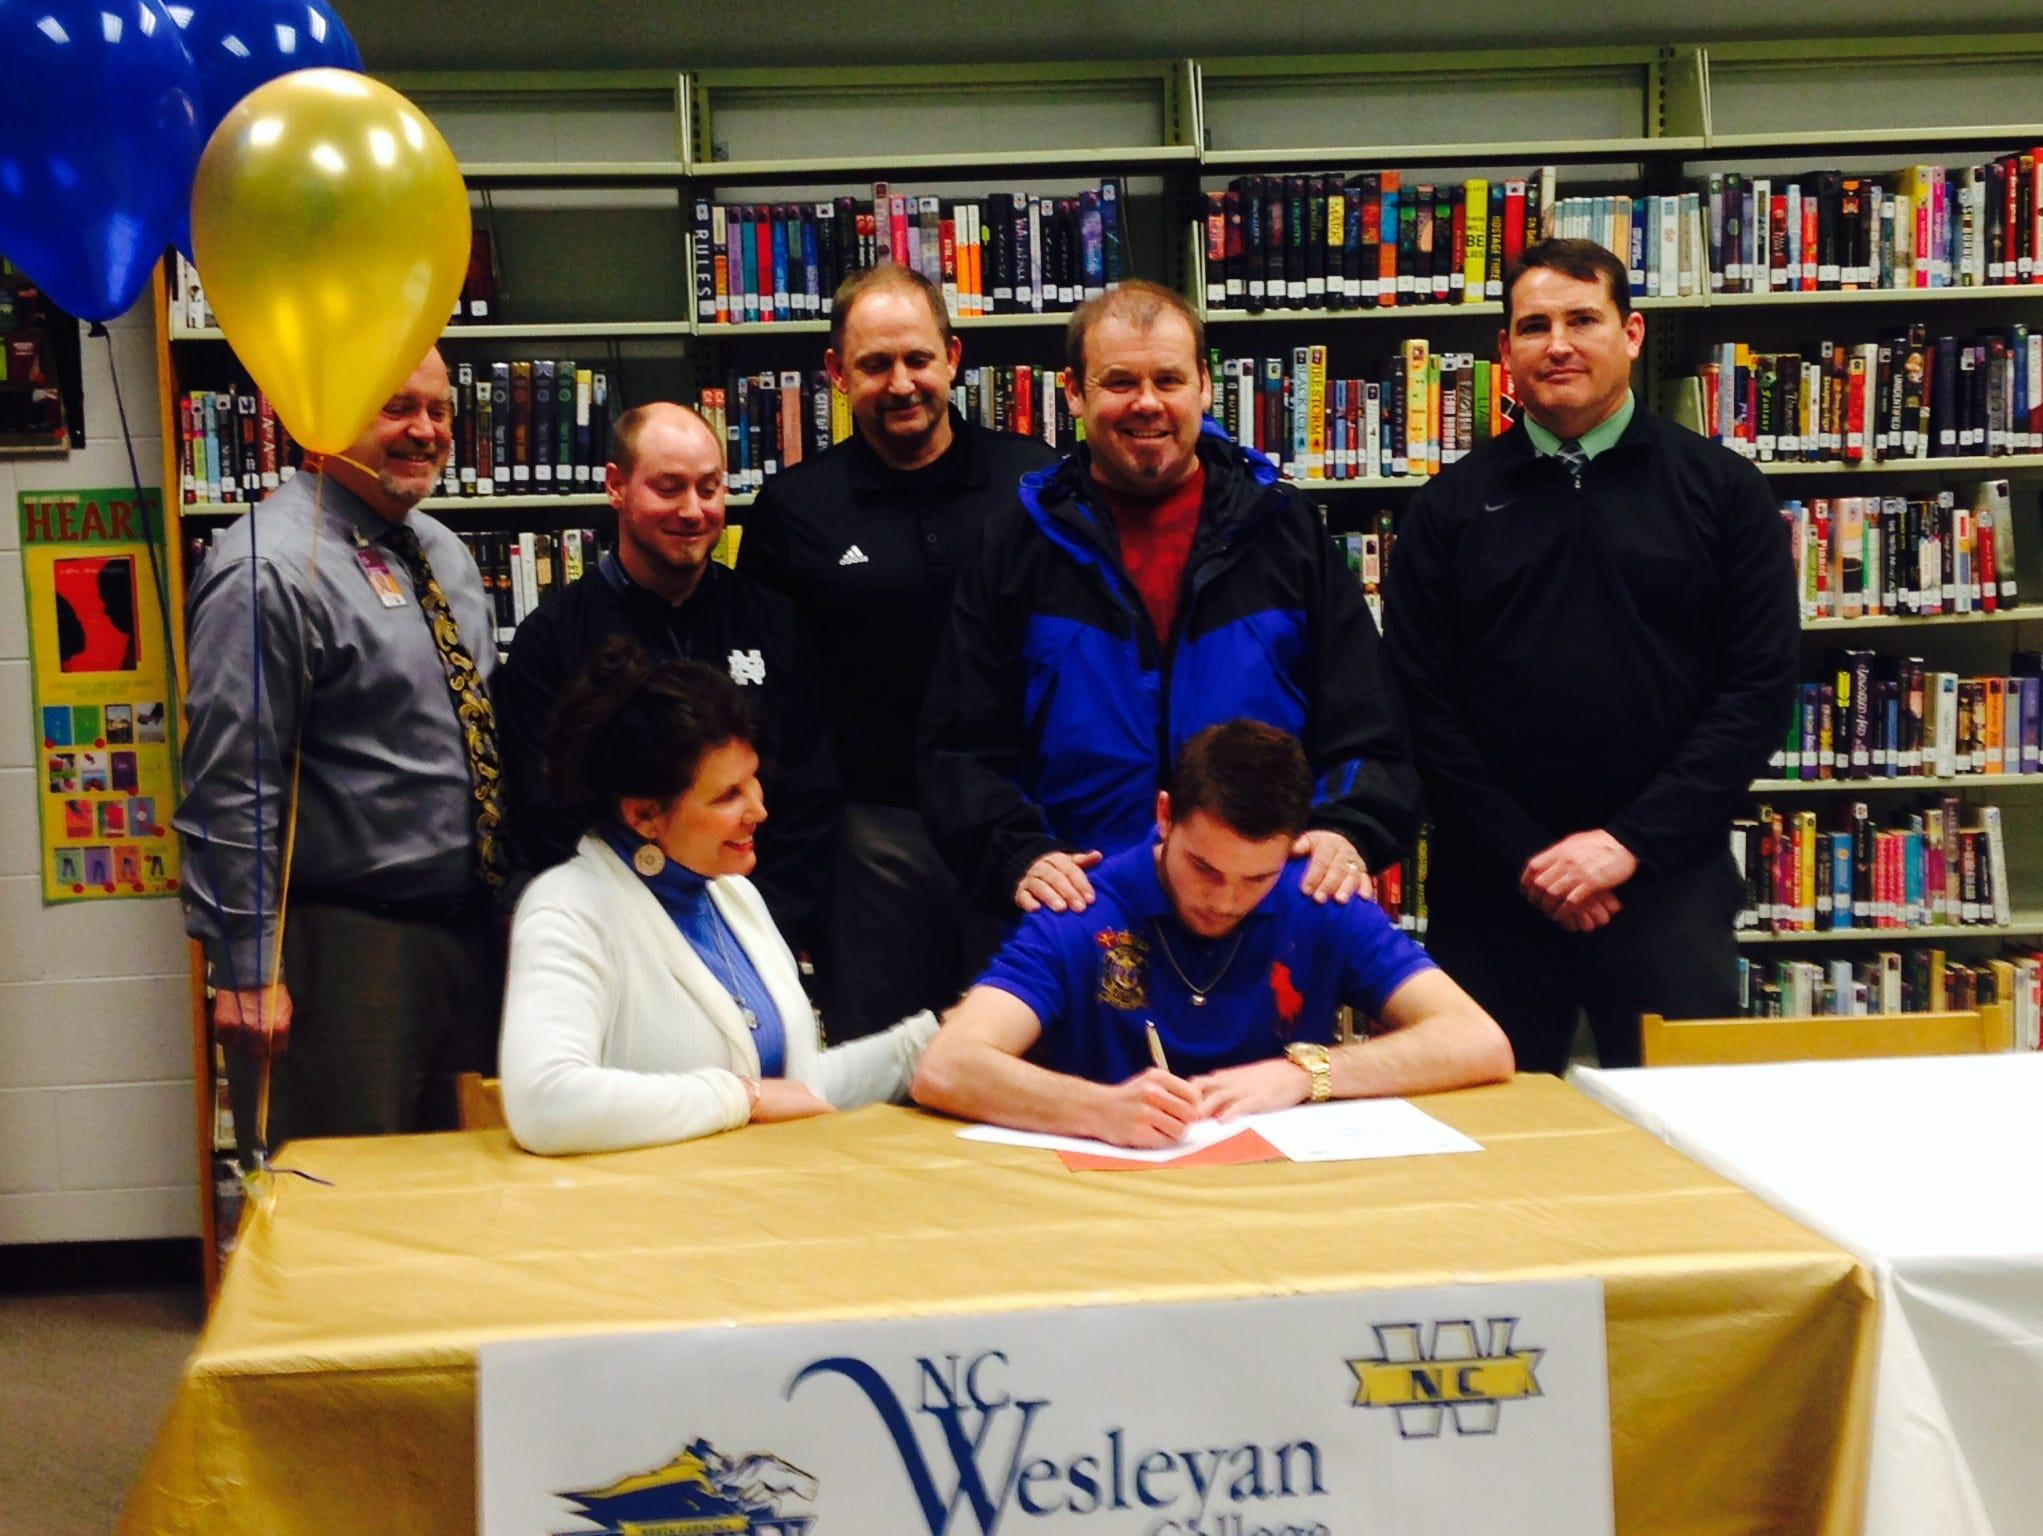 North Buncombe senior Ricky Thrash has signed to play college football for North Carolina Wesleyan.